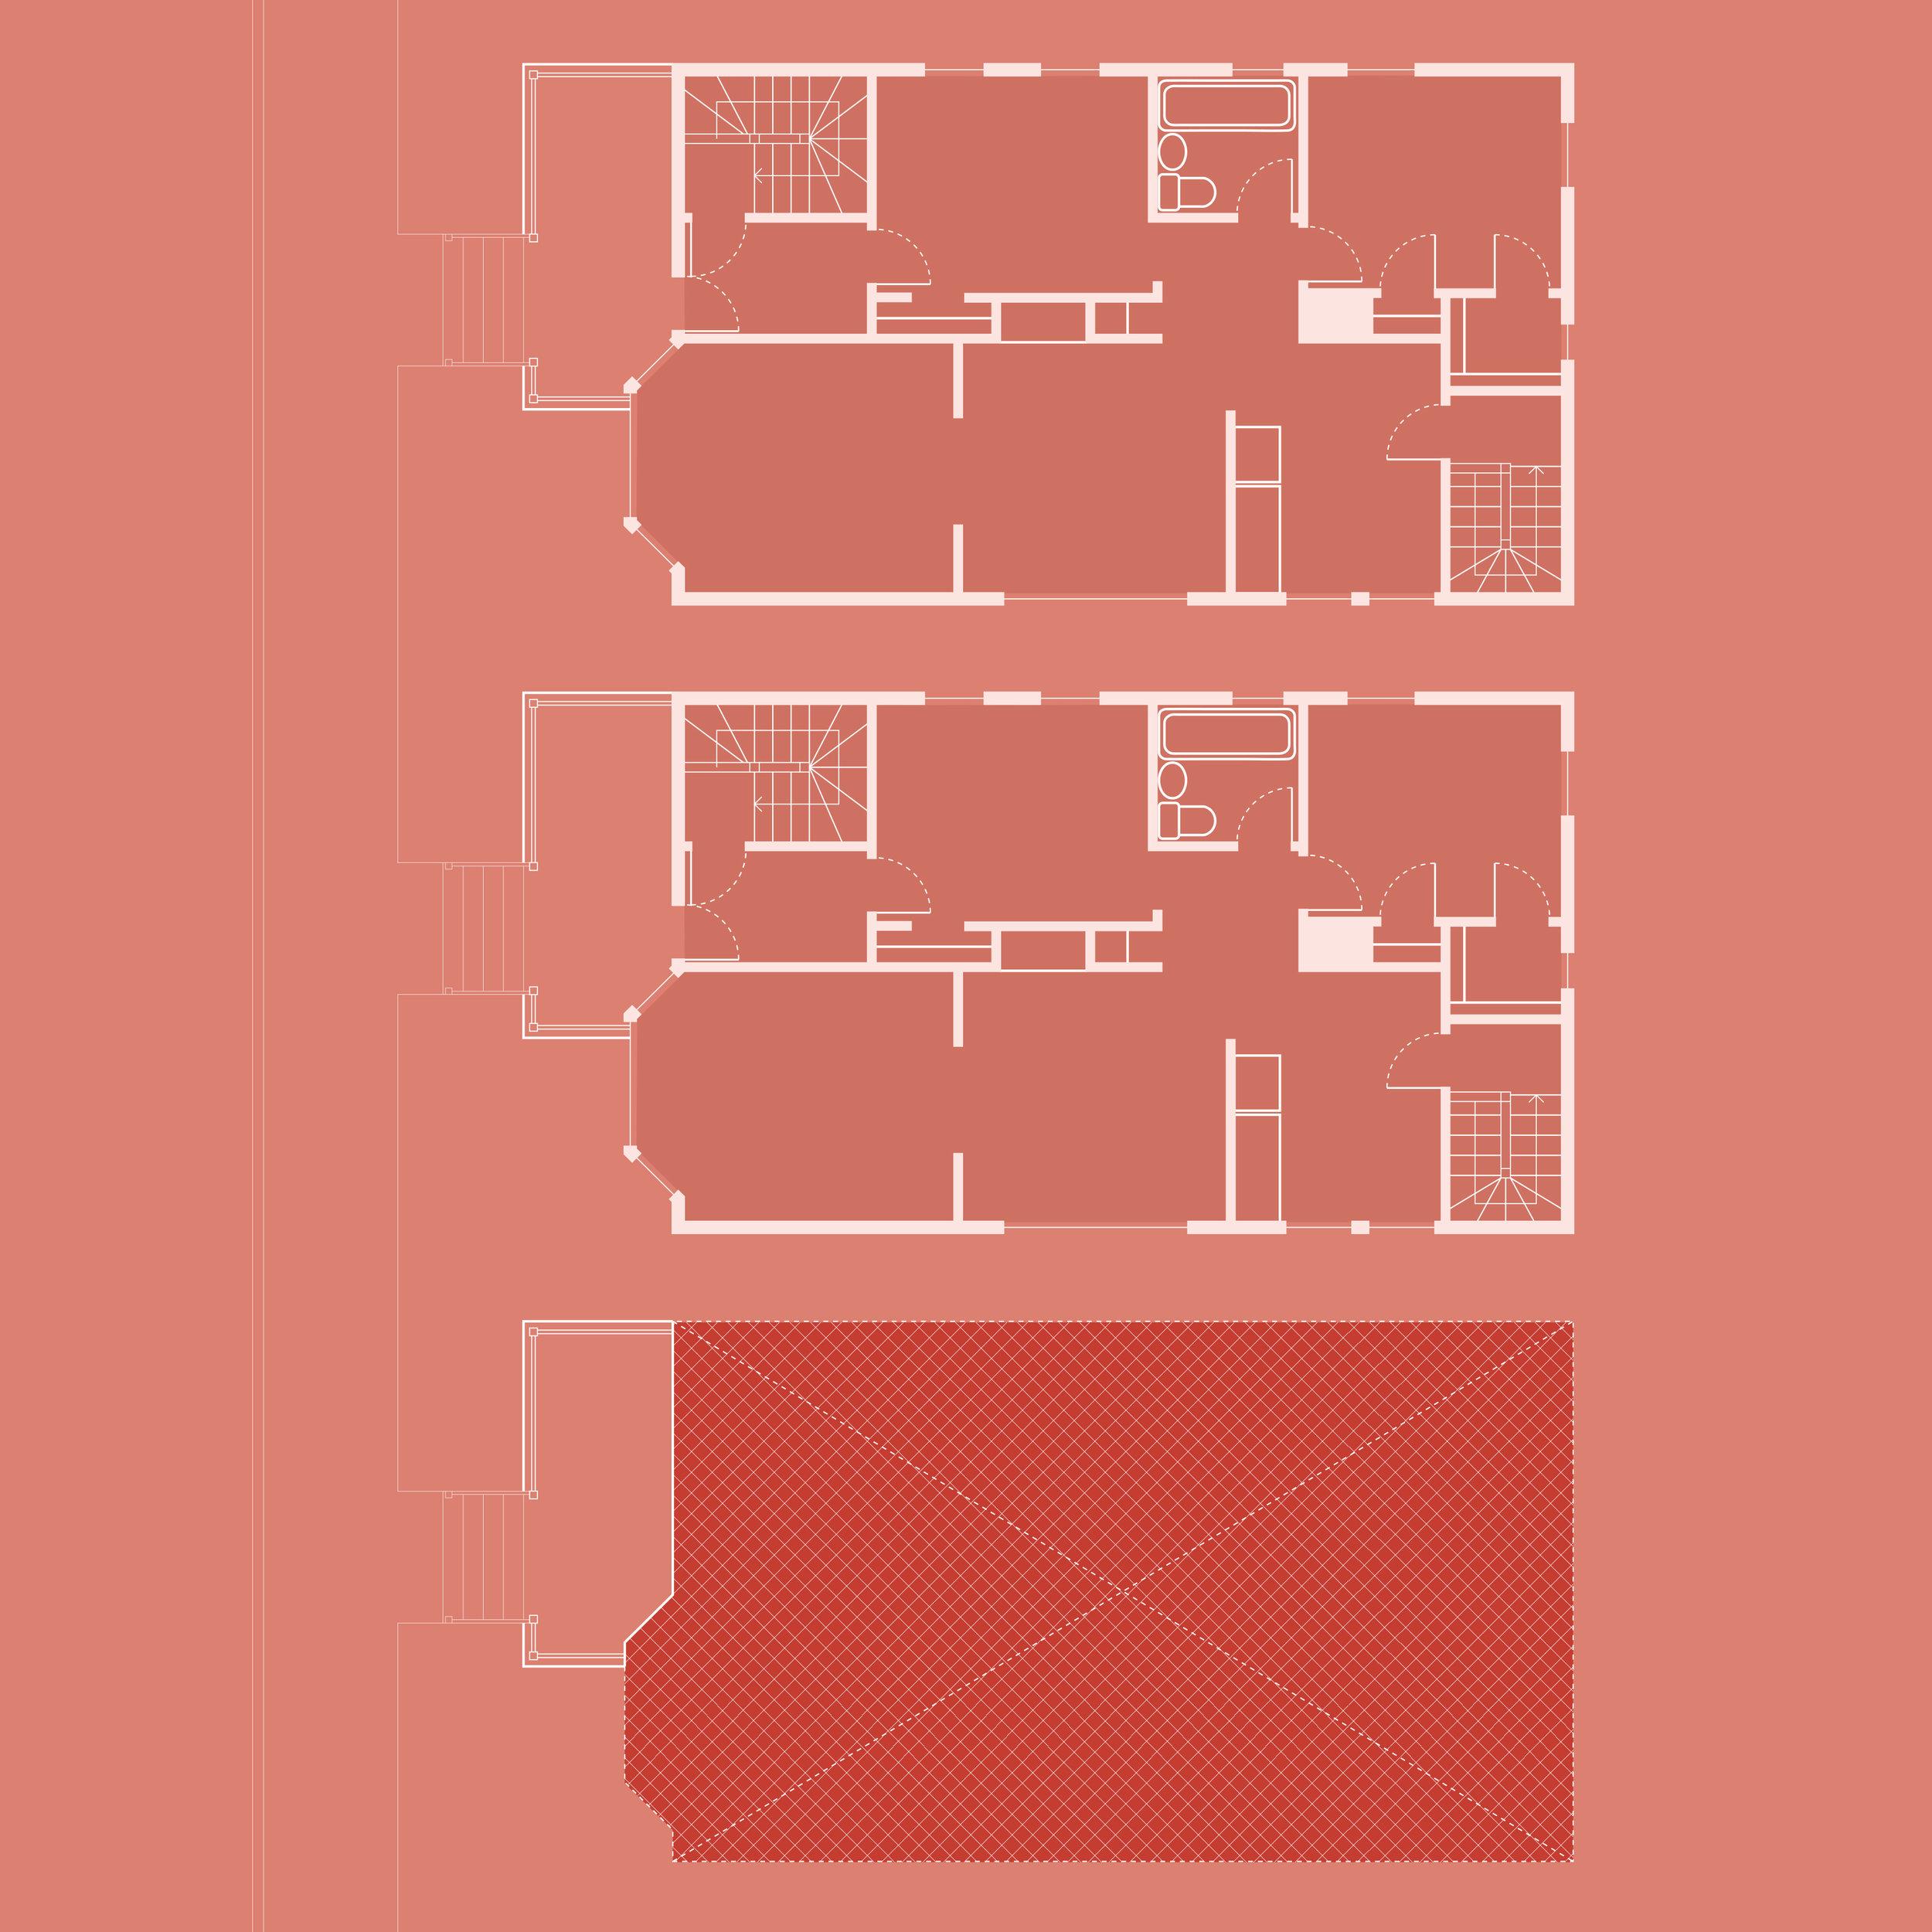 TripleDecker_Wormhole_Plans-8.jpg